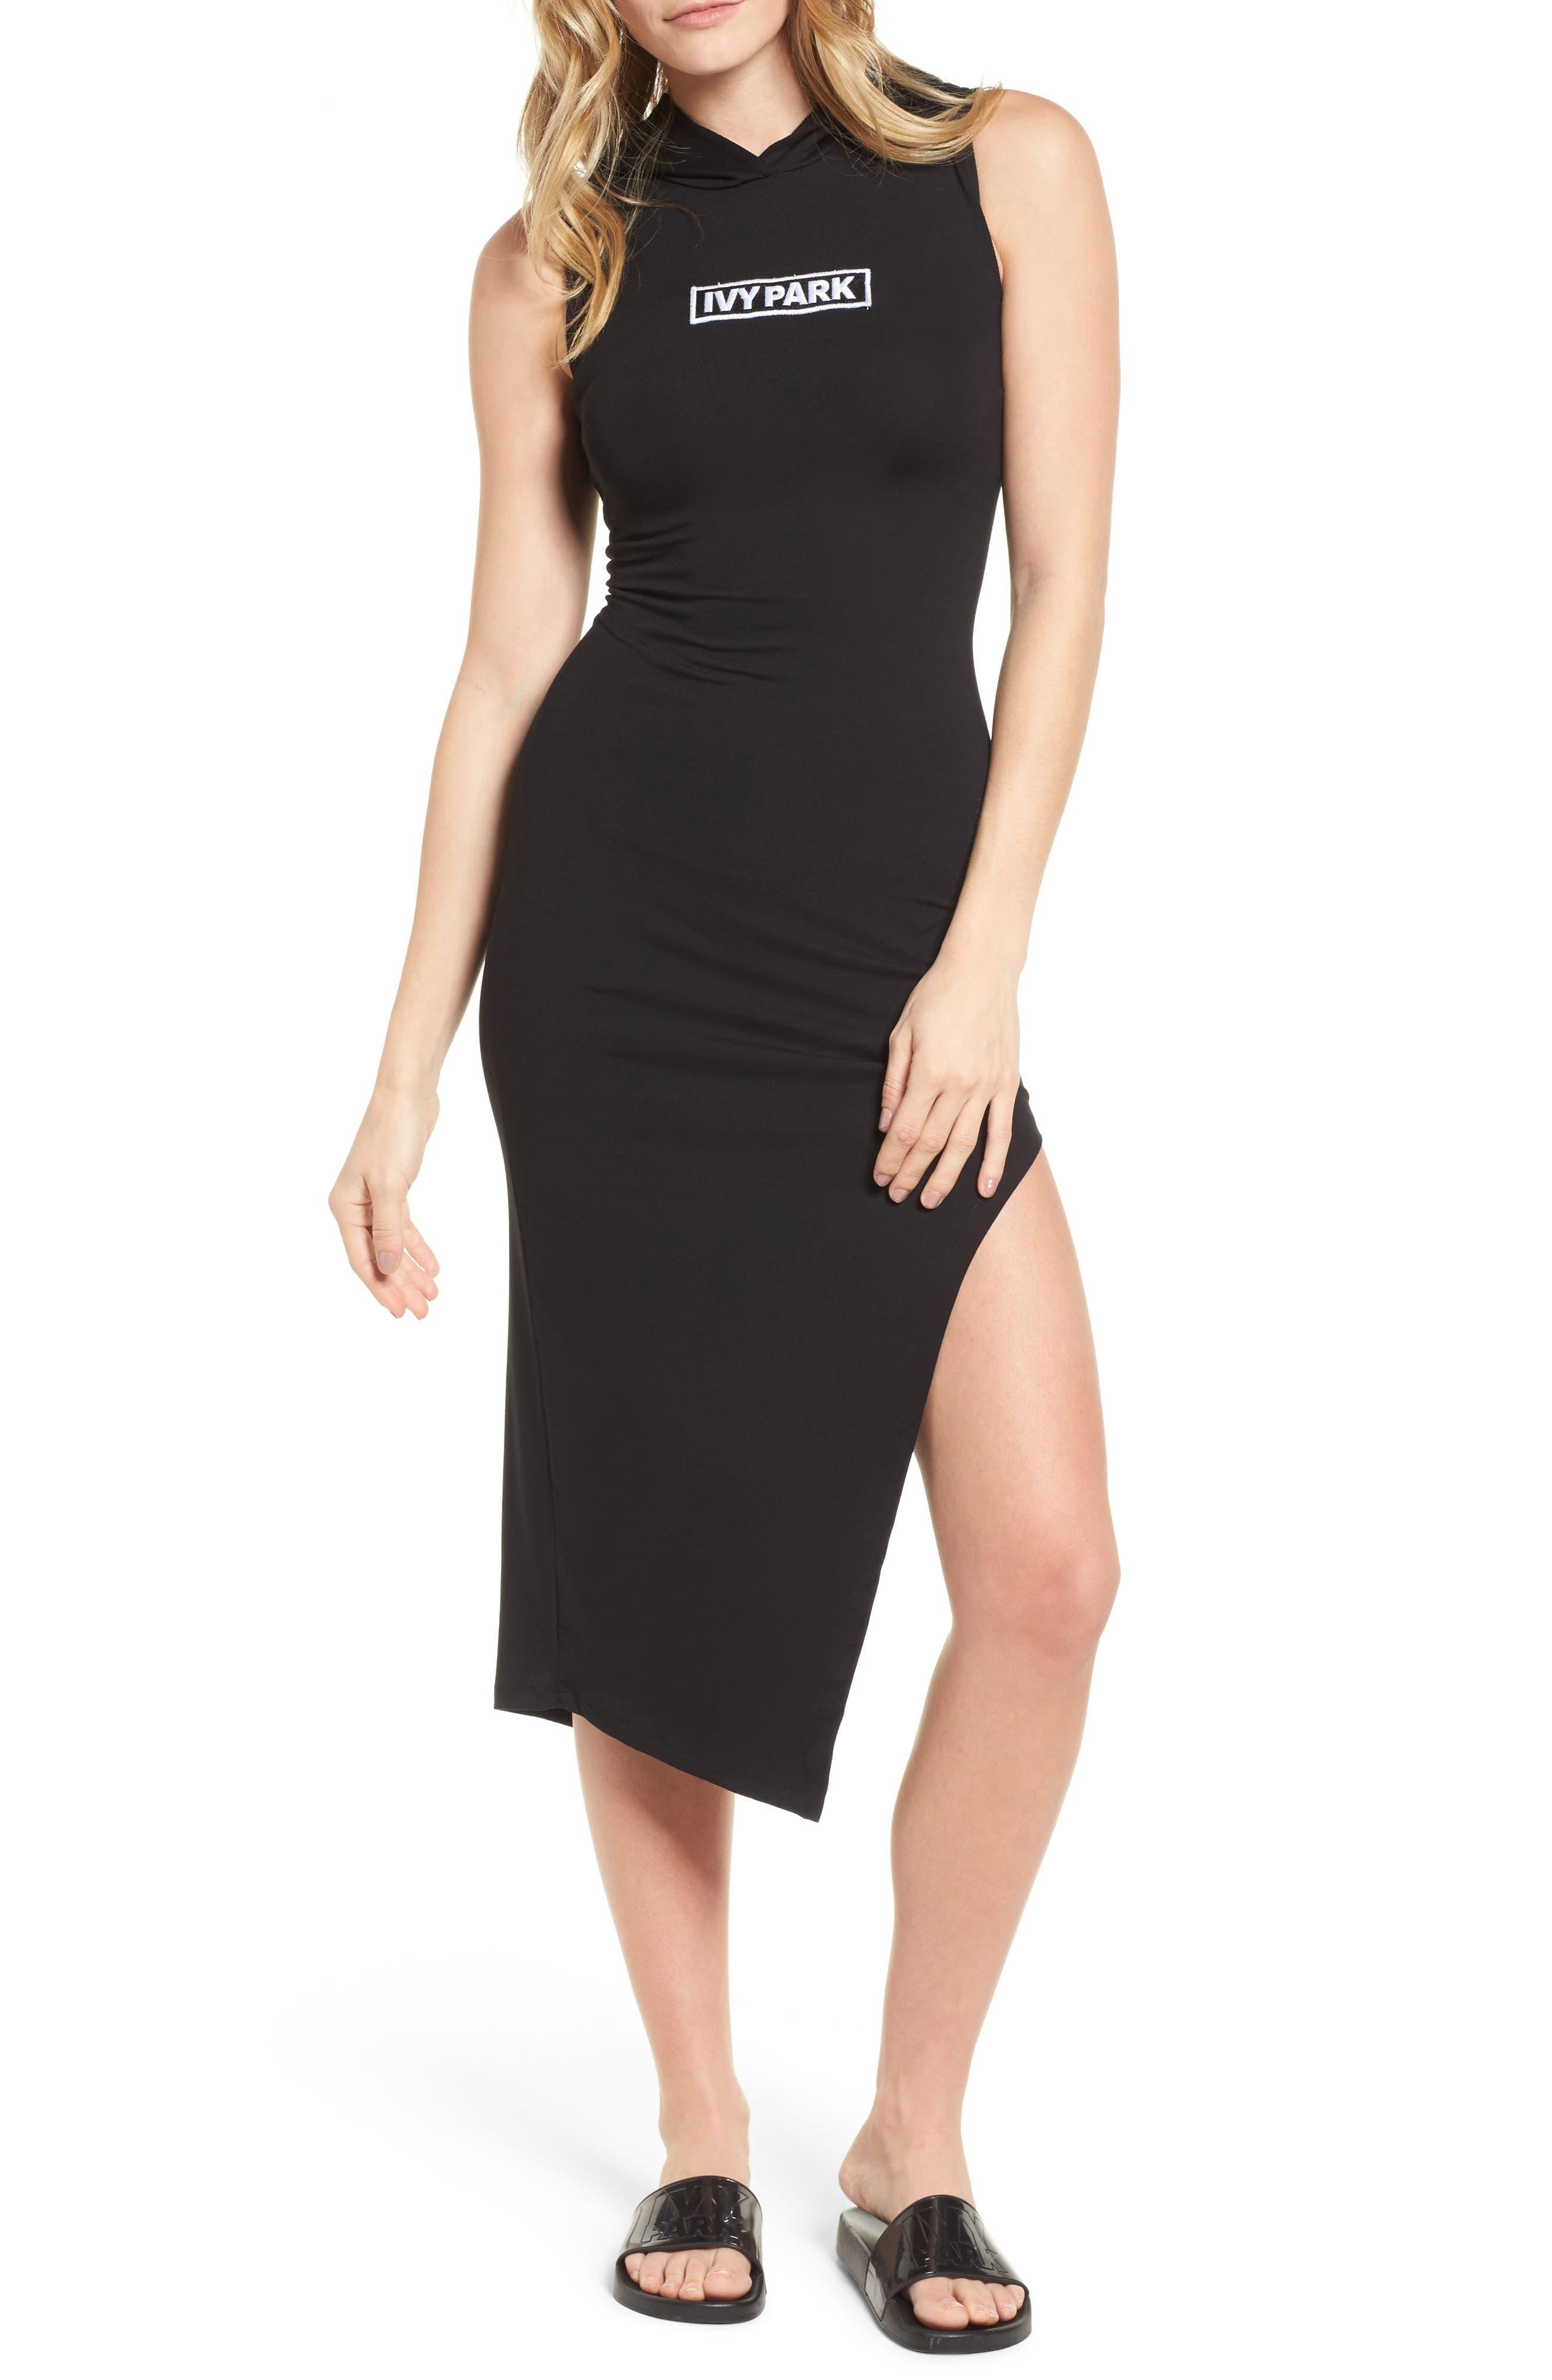 Main Image - IVY PARK® Lace-Up Back Hooded Dress